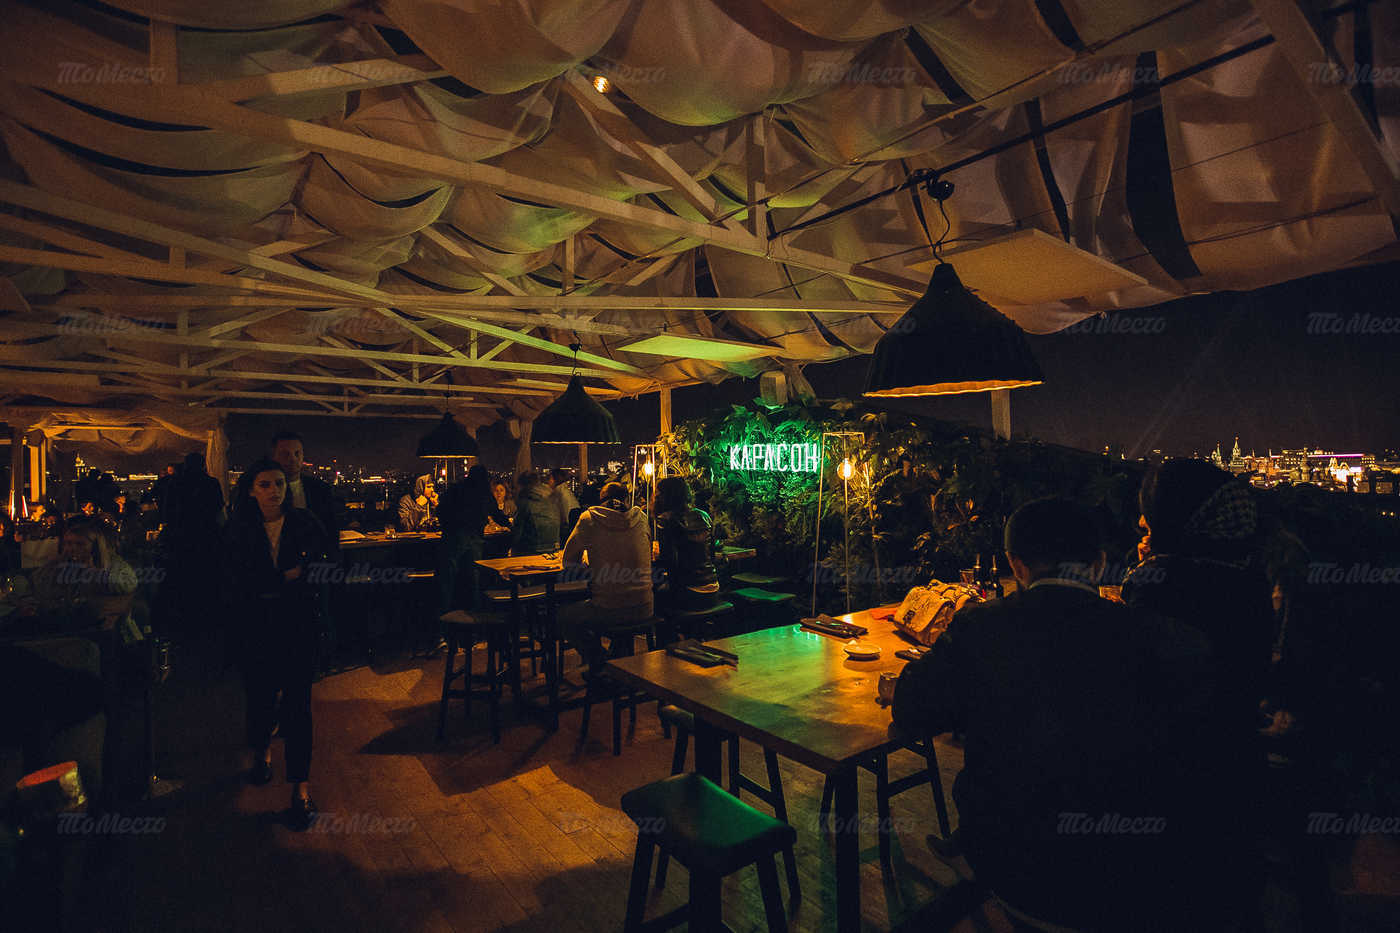 Ресторан Карлсон на Овчинниковской набережной фото 27